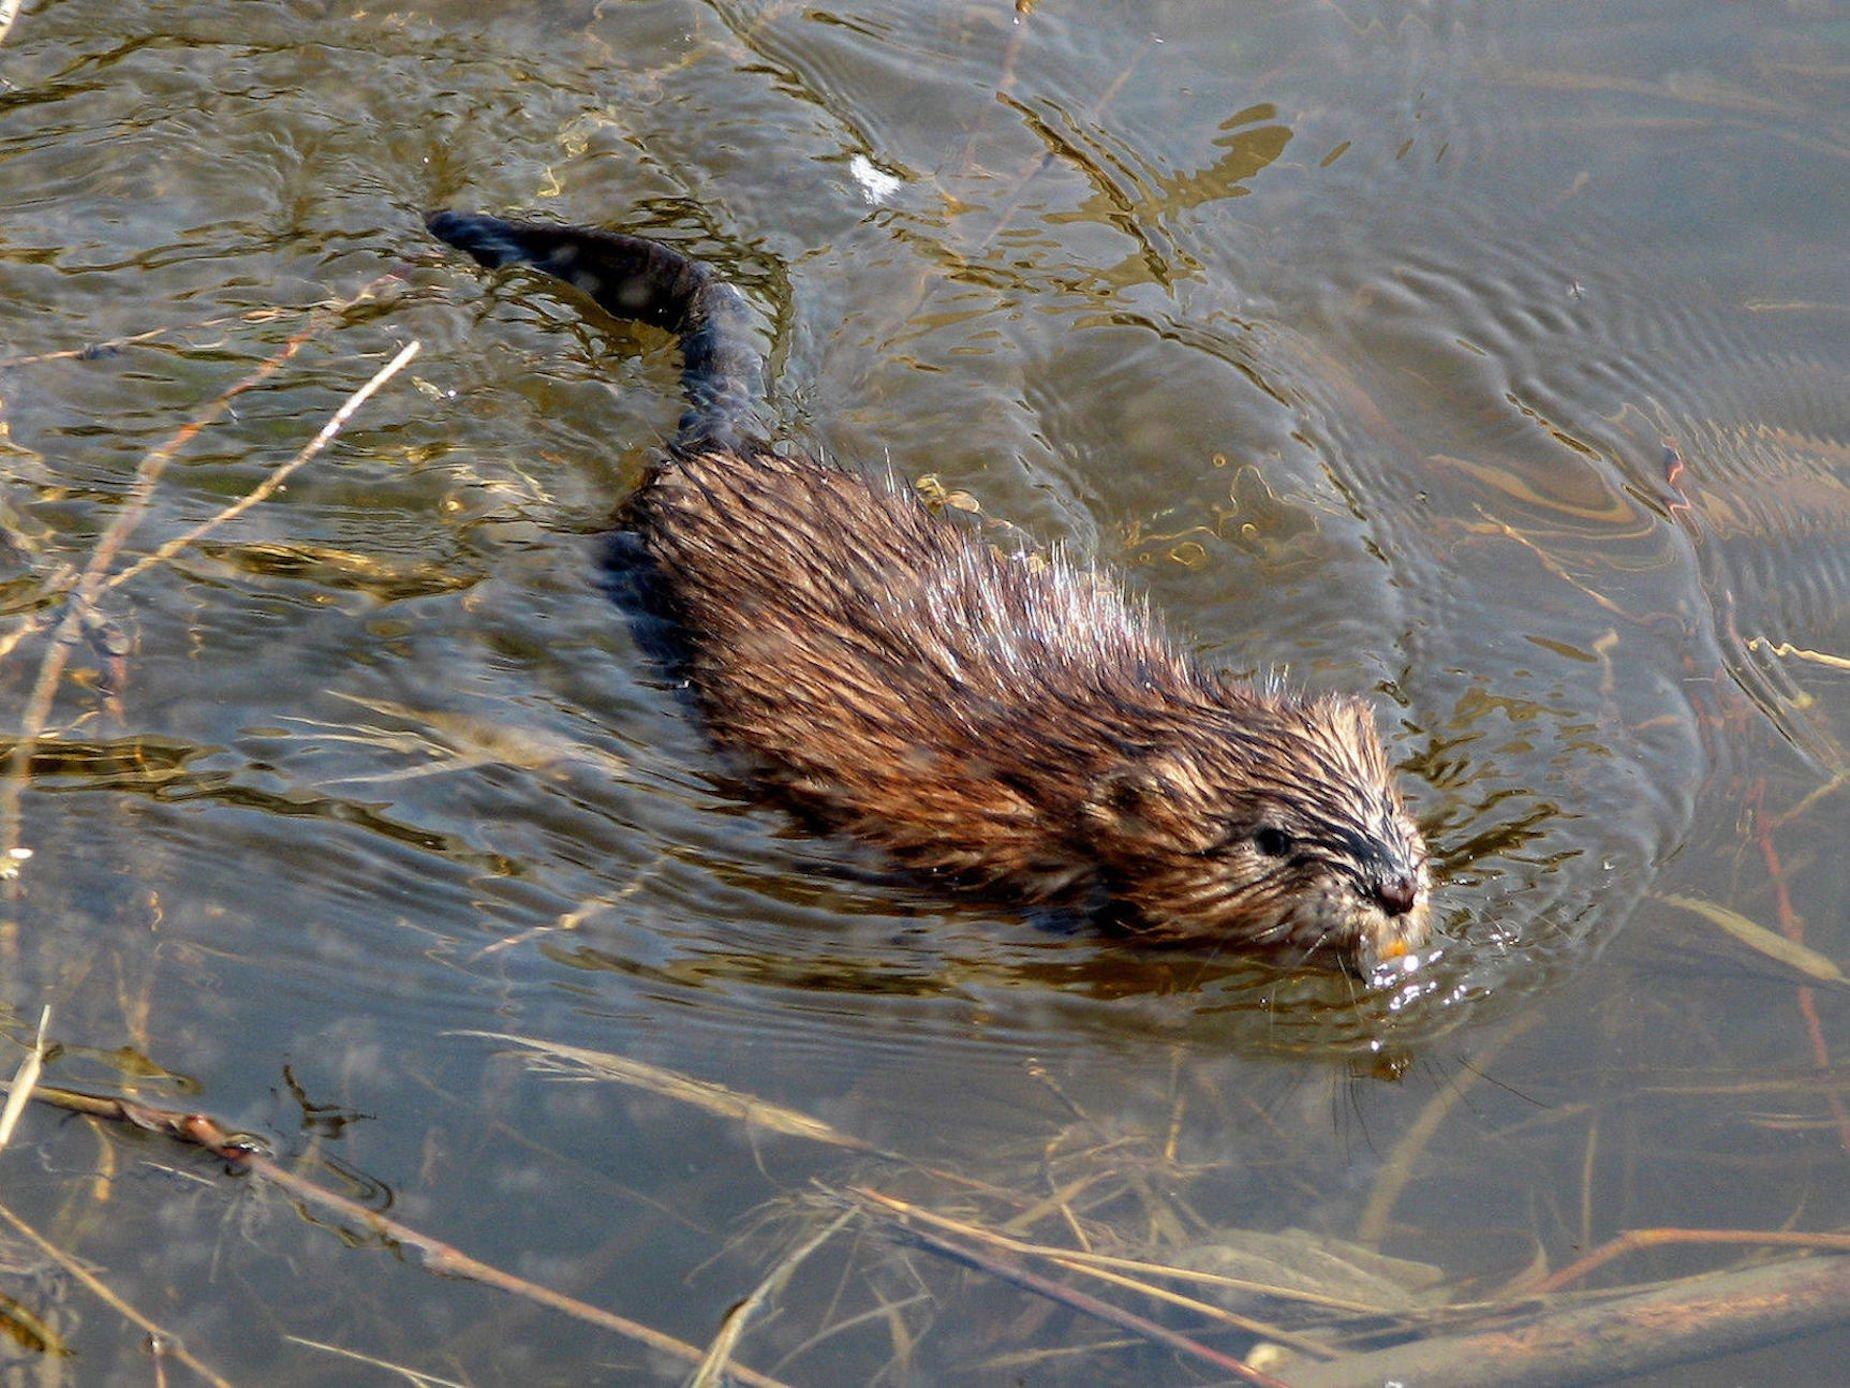 Muskrat swimming in Ottawa river by D. Gordon E. Robertson